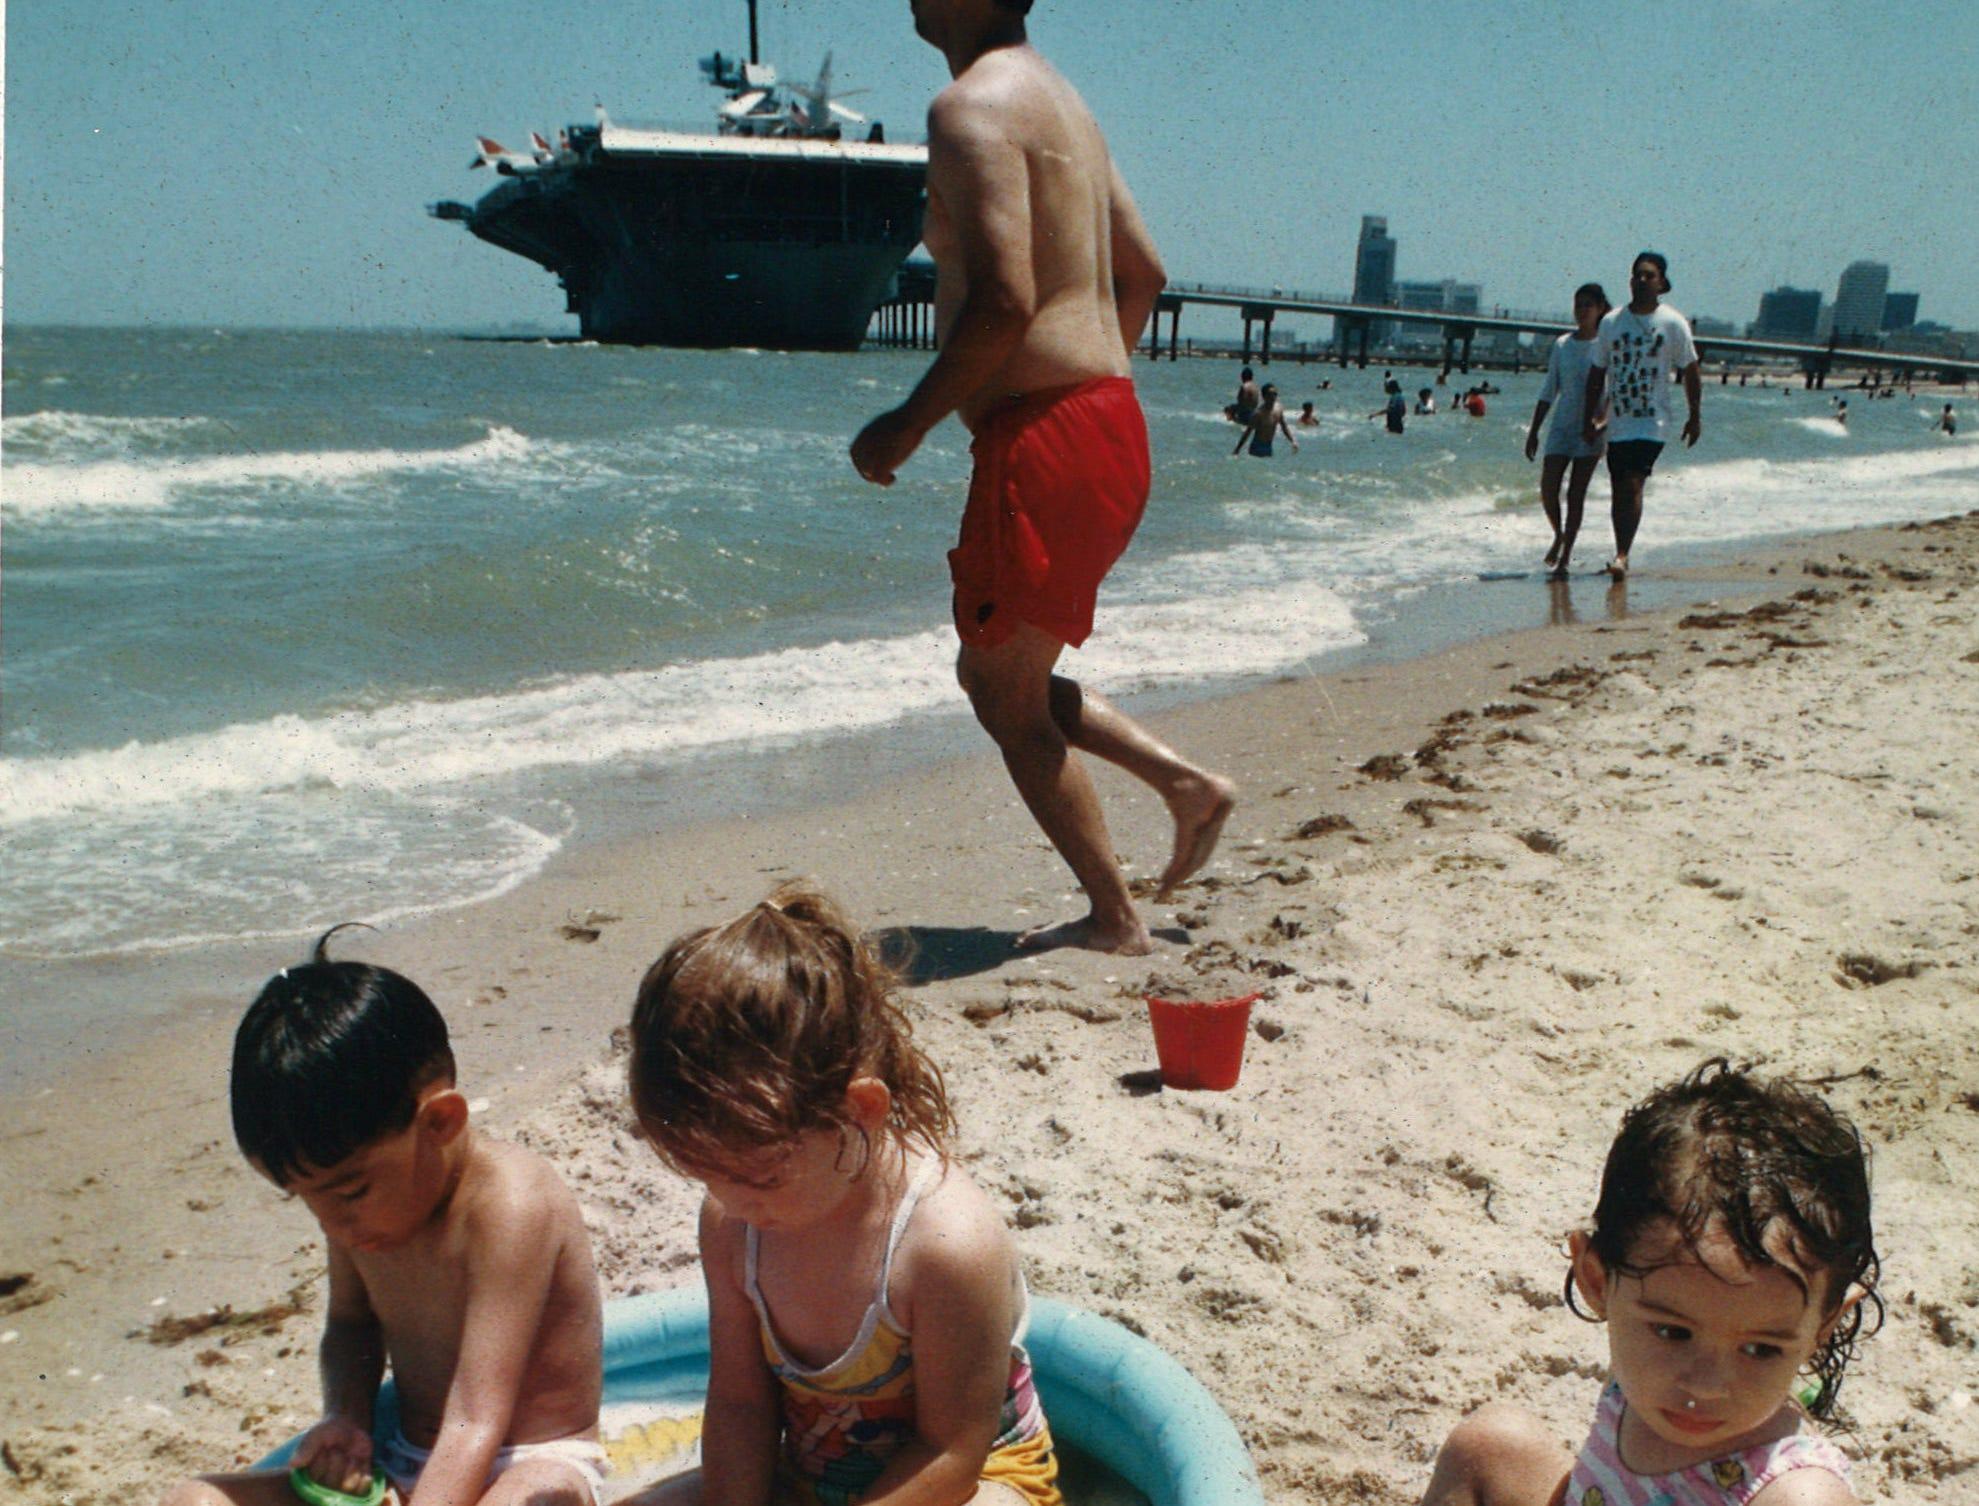 Joshua Garza, 4,; Dawn Quiroz, 3,; and Monica Garza, 2, use a small wading pool at the edge of the water at Corpus Christi's North Beach on May 30, 1995.